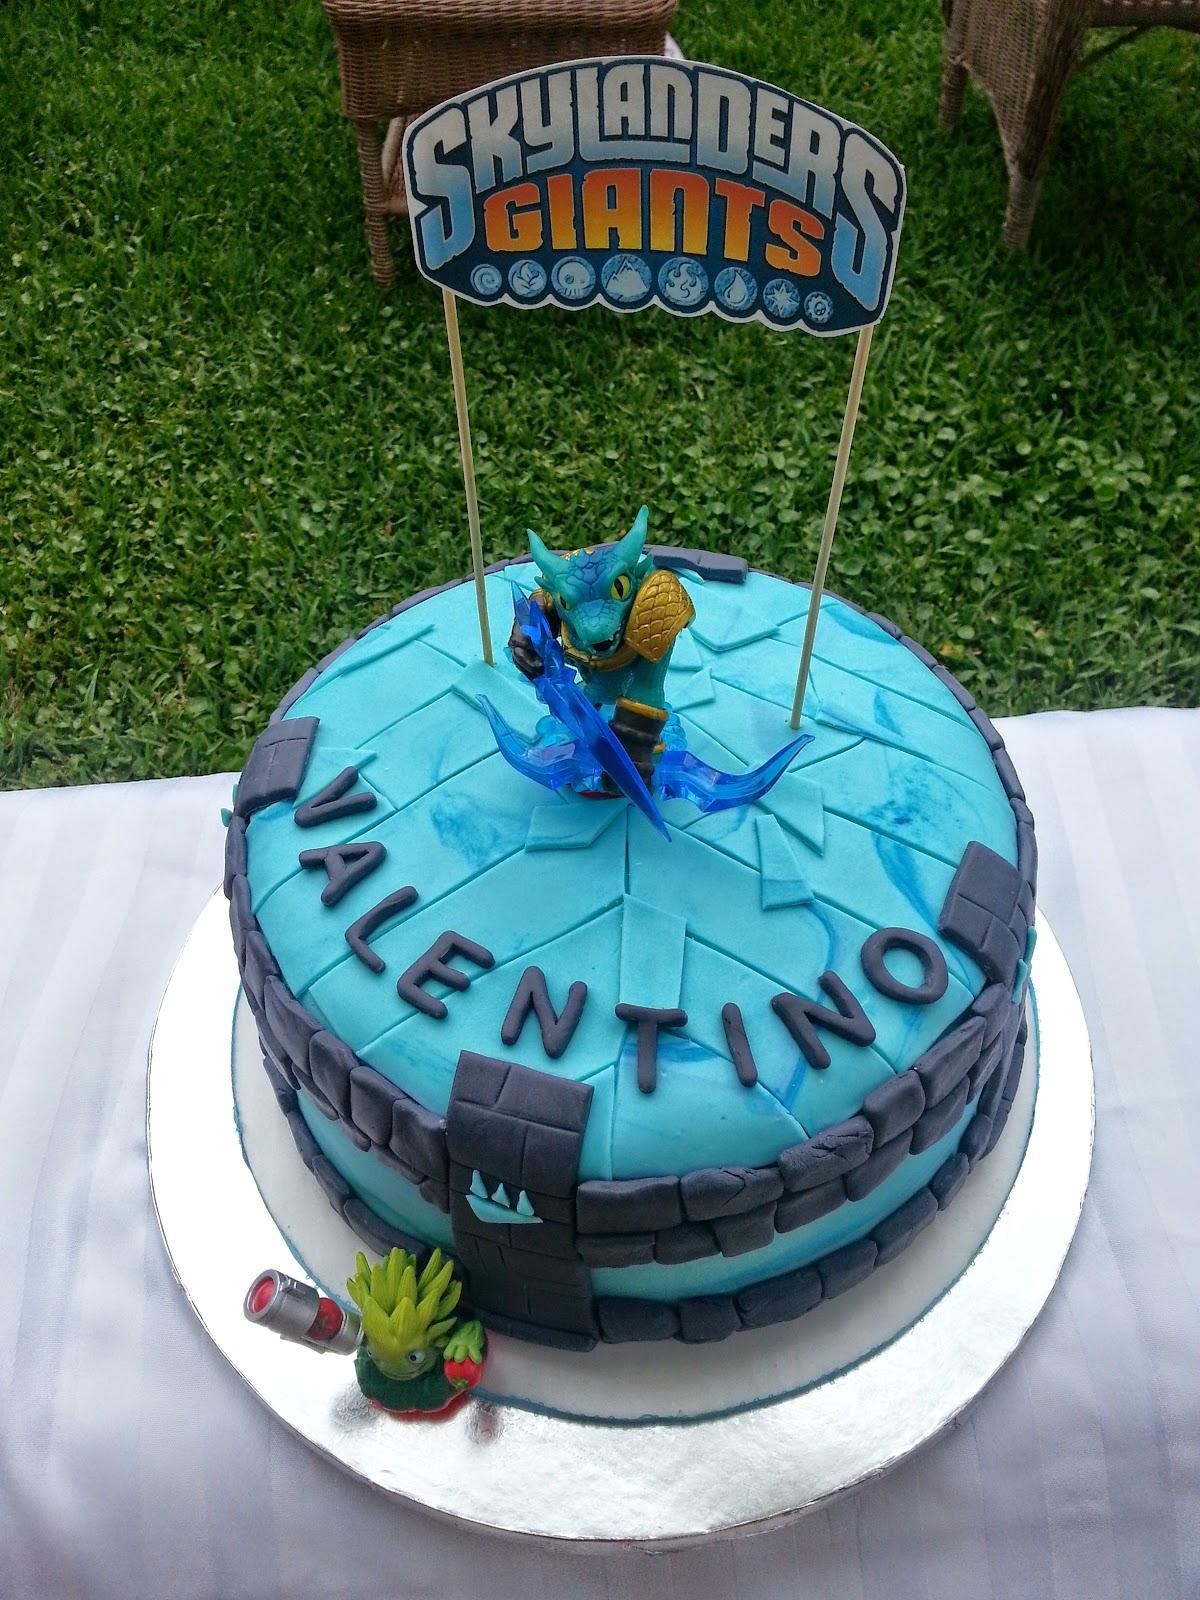 Nanas Theme Party Skylanders Giantsrthday Cake